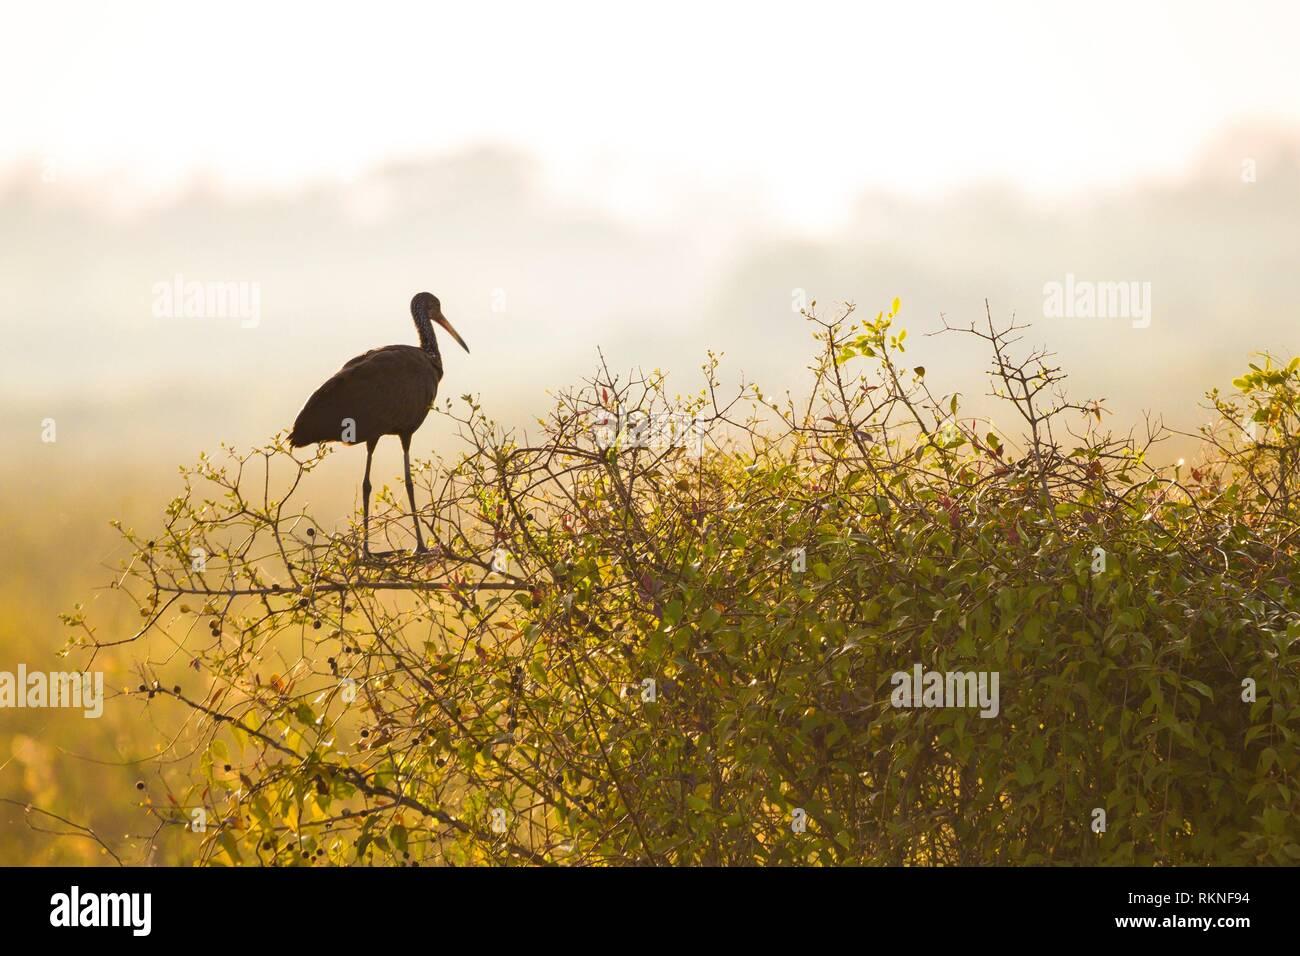 Limpkin, Aramus guarauna, Mato Grosso, el Pantanal de Mato Grosso, Brasil. Foto de stock